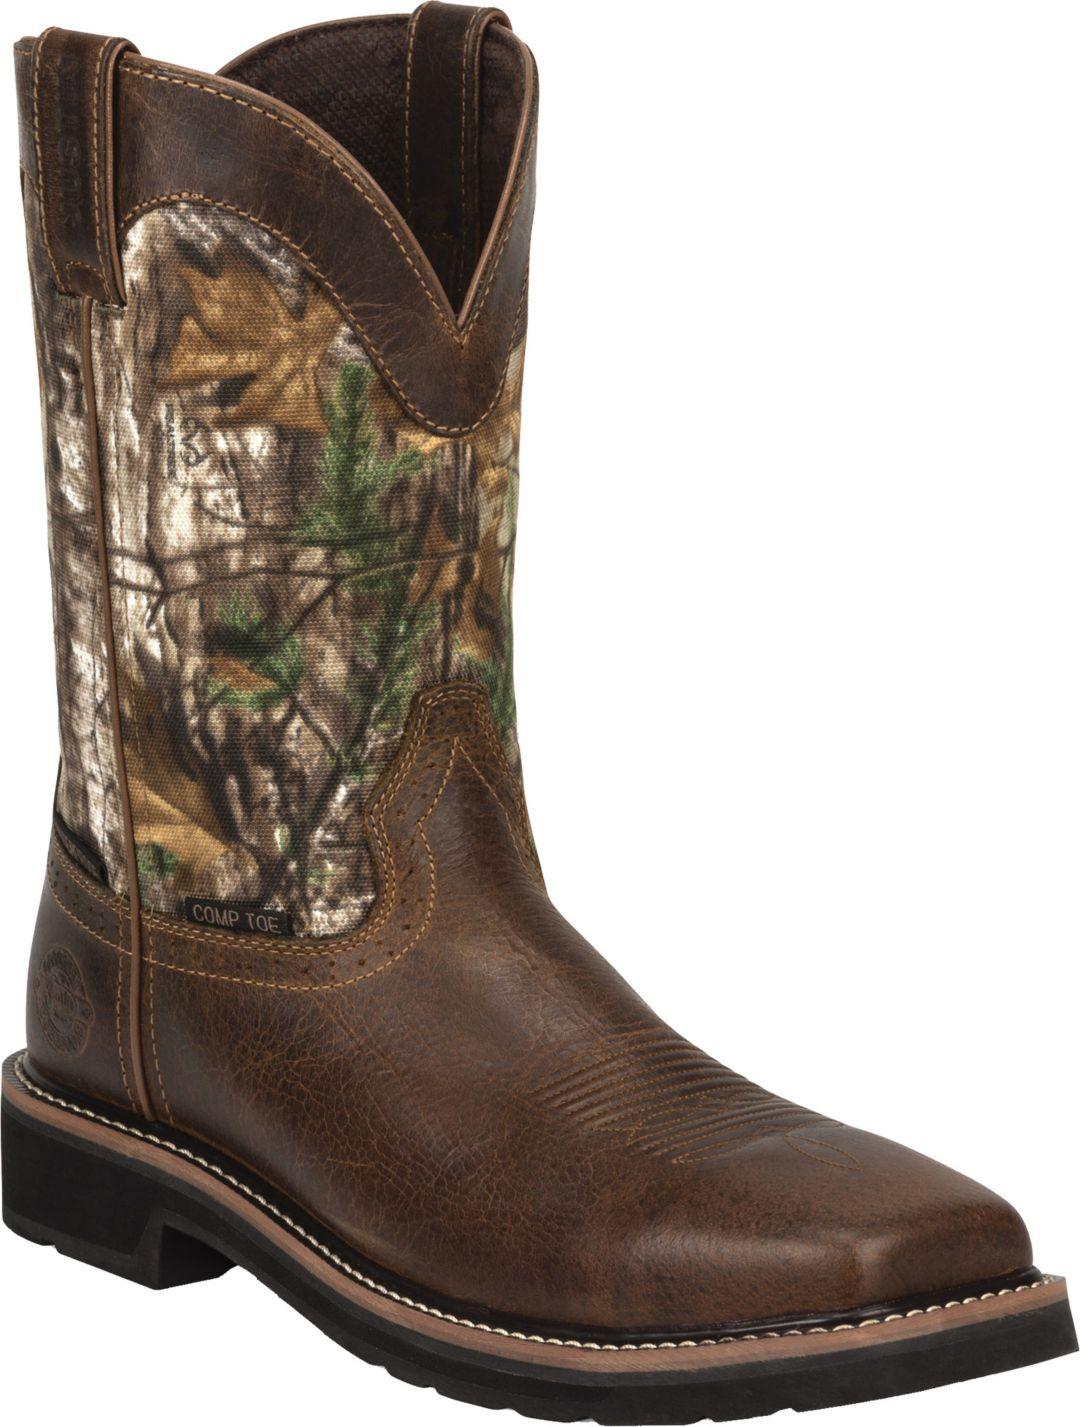 0a2b4ead15d2e Justin Men's Stampede EH Waterproof Composite Toe Work Boots. noImageFound.  1